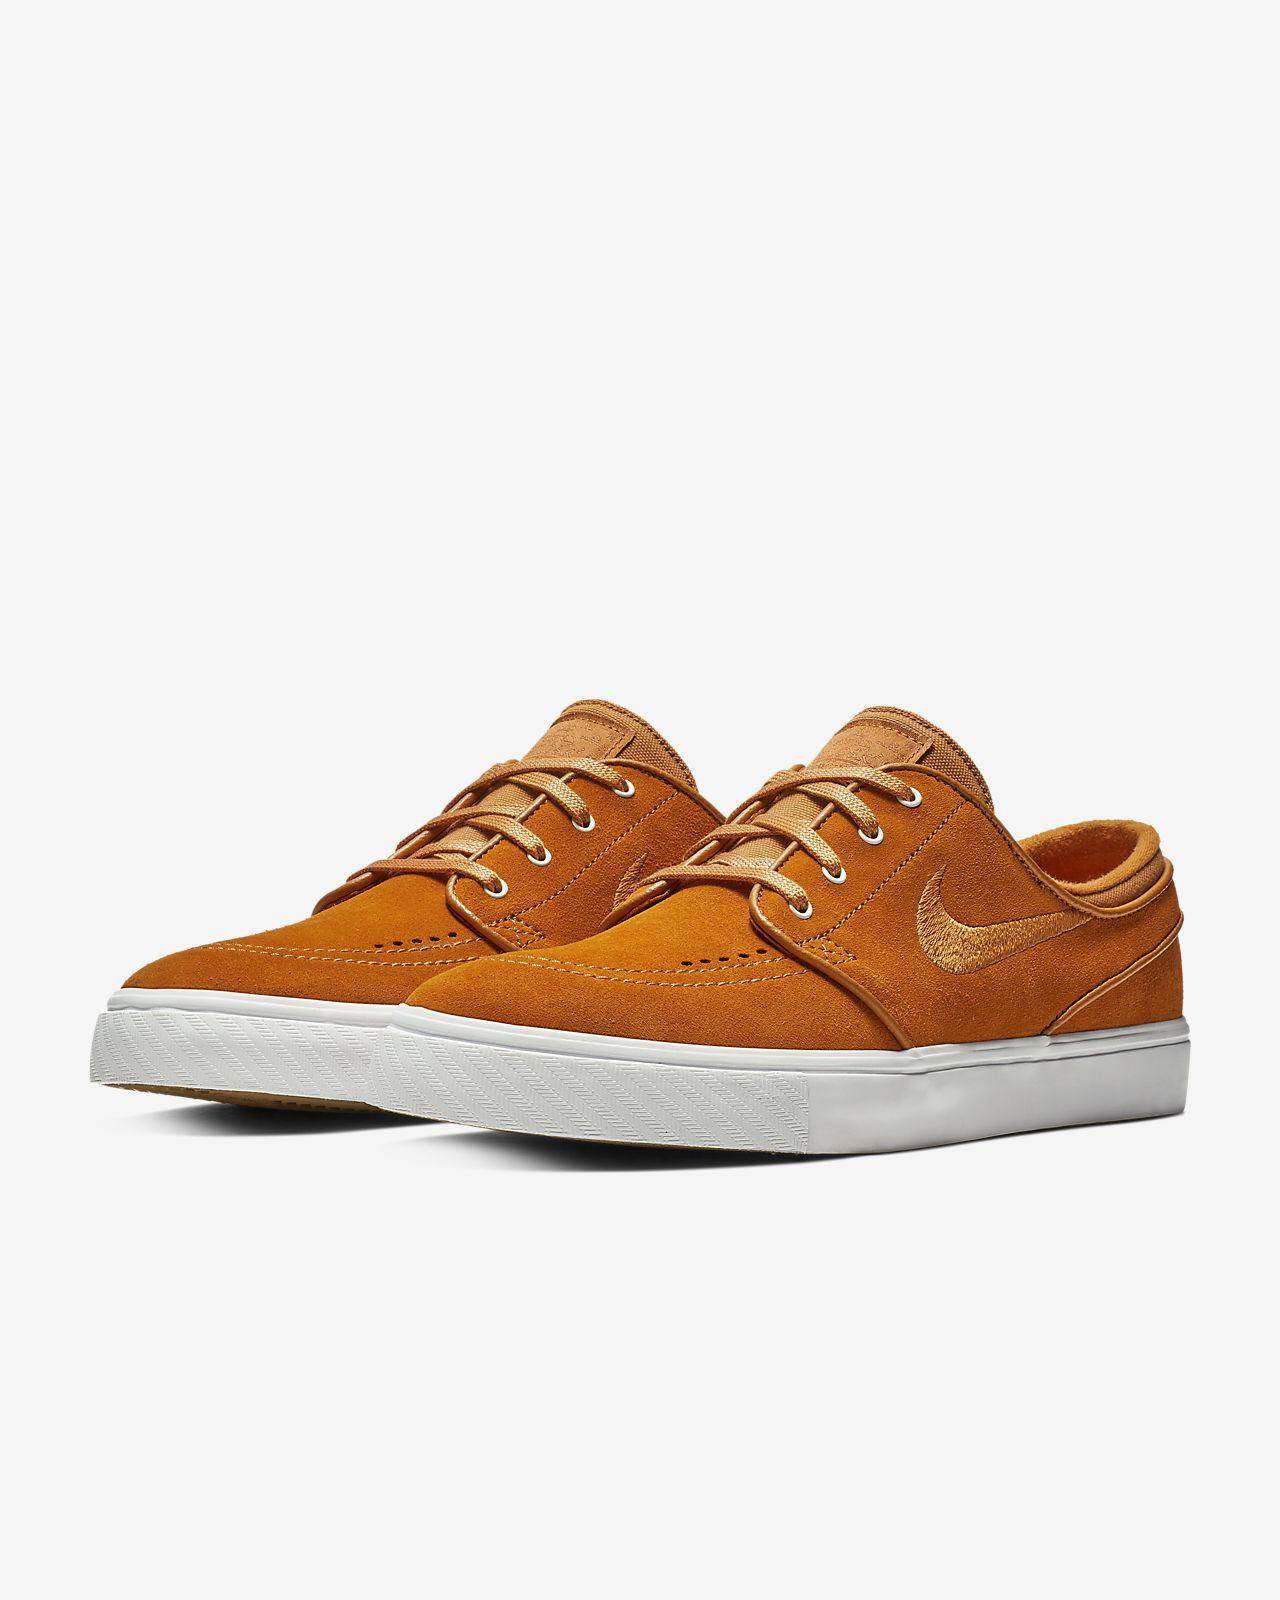 promo code 7f45c 57ee8 ... Nike Zoom Stefan Janoski Men s Skate Shoe